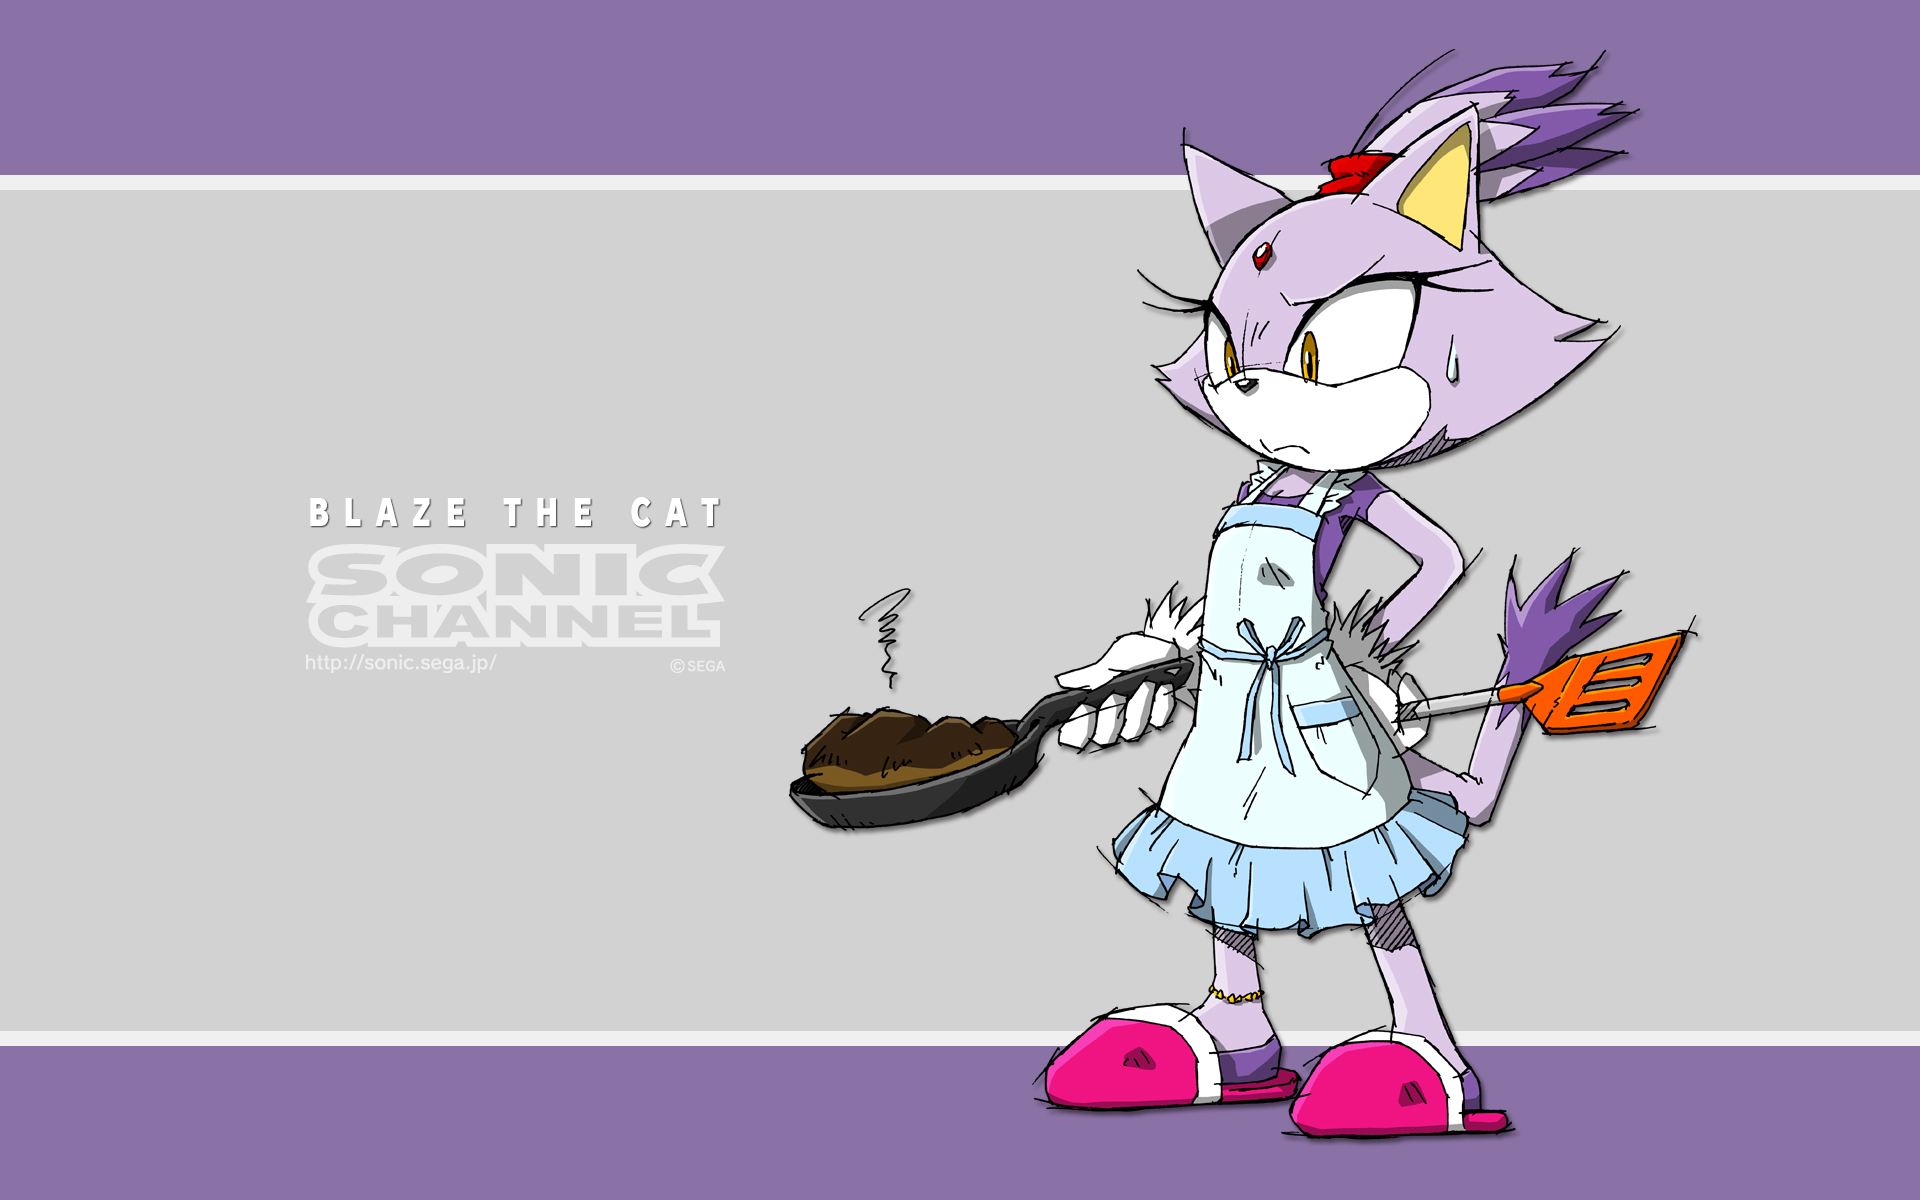 Sonic Channel - 8/20/14